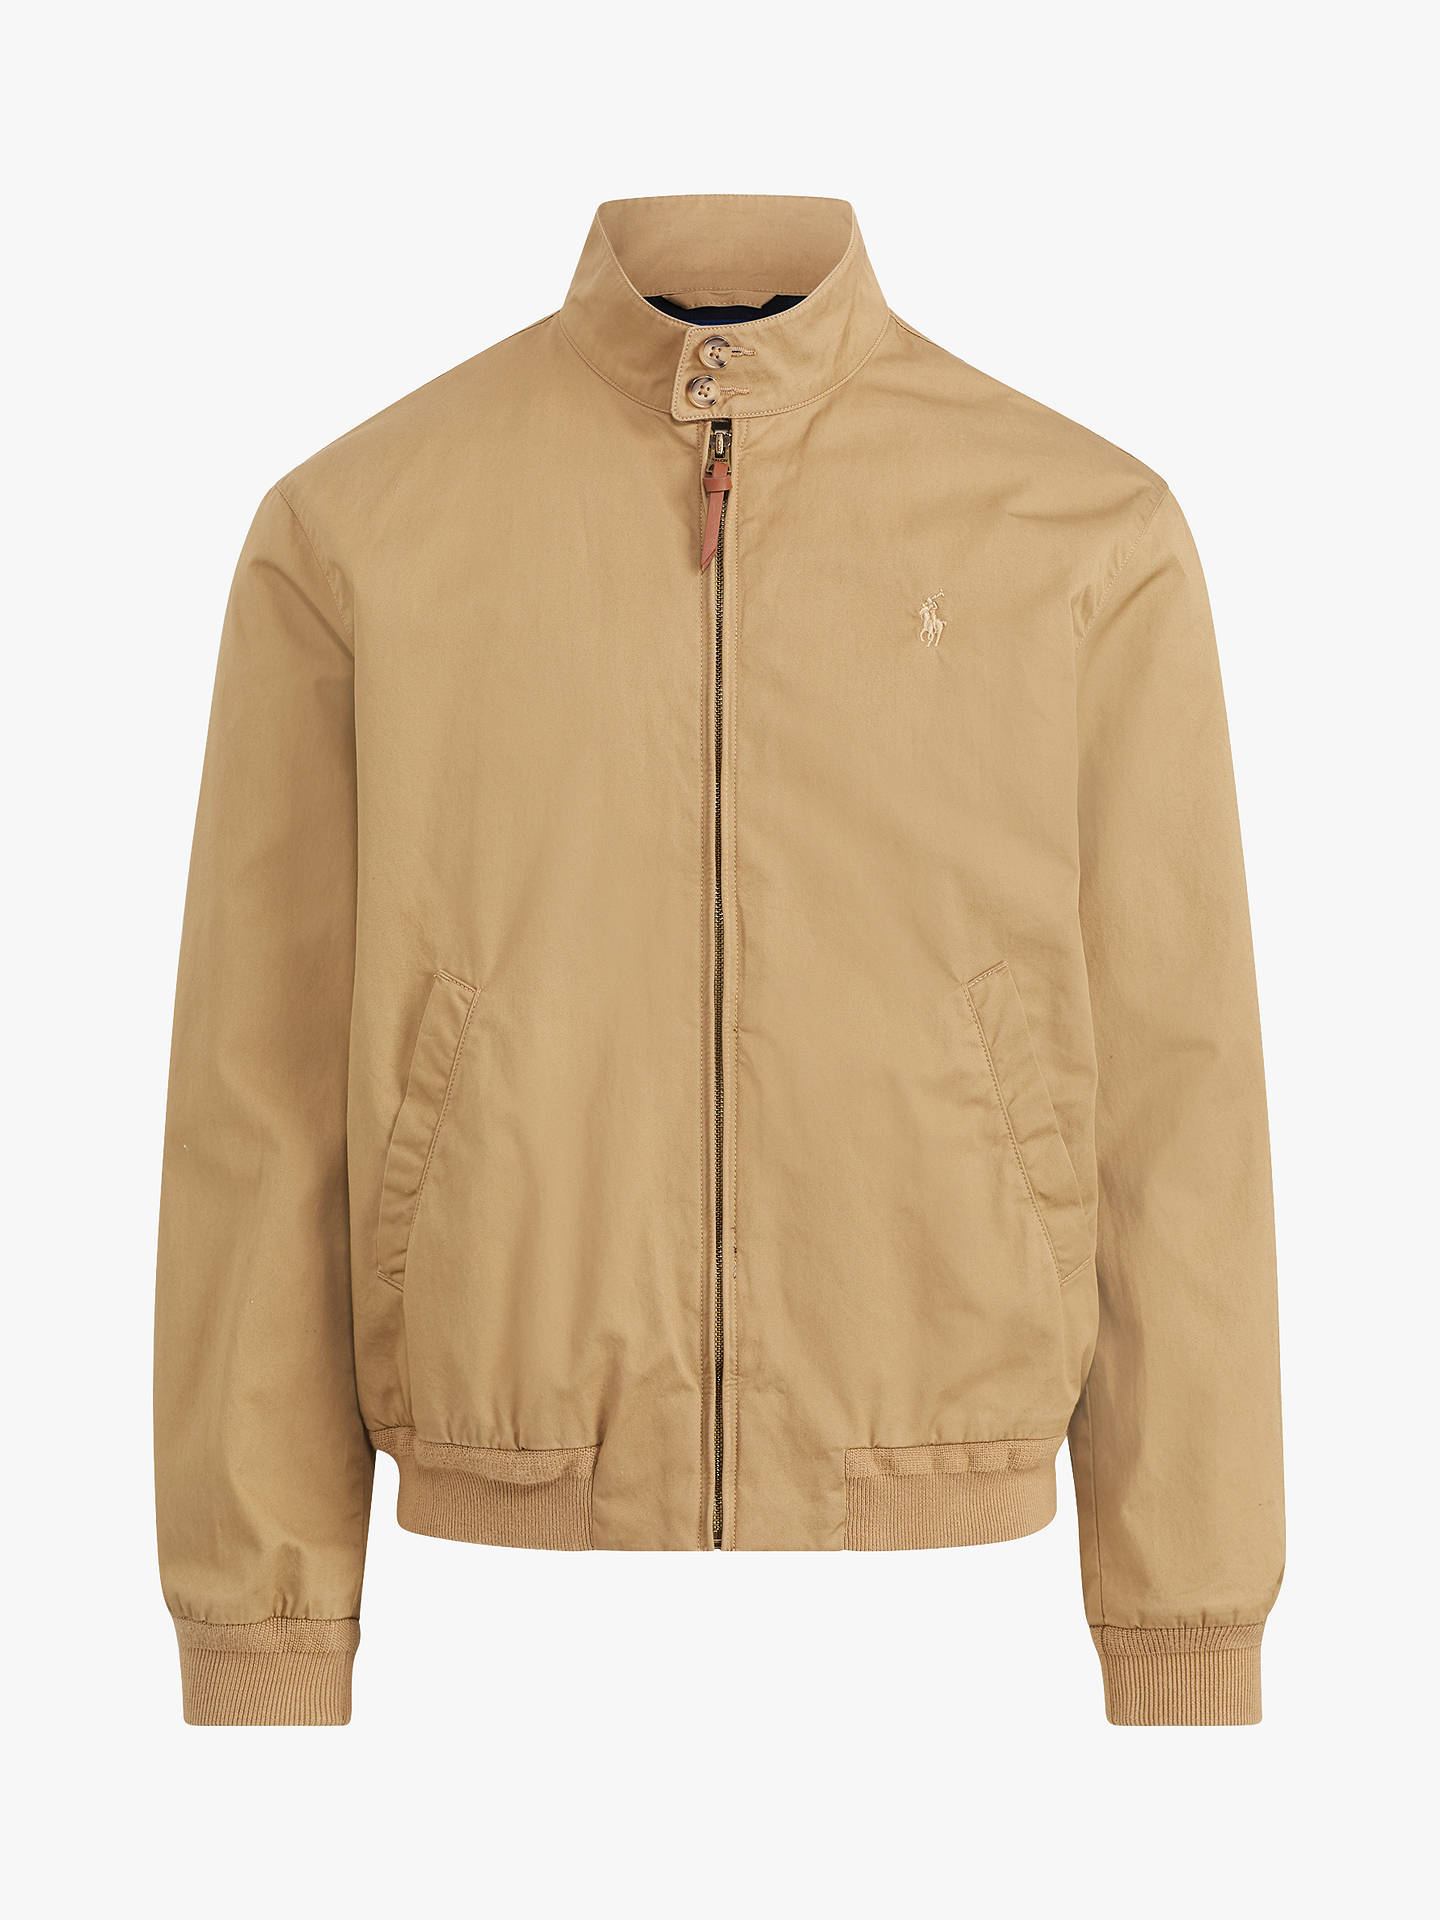 9305d005b754 Buy Polo Ralph Lauren Barracuda Lined Jacket